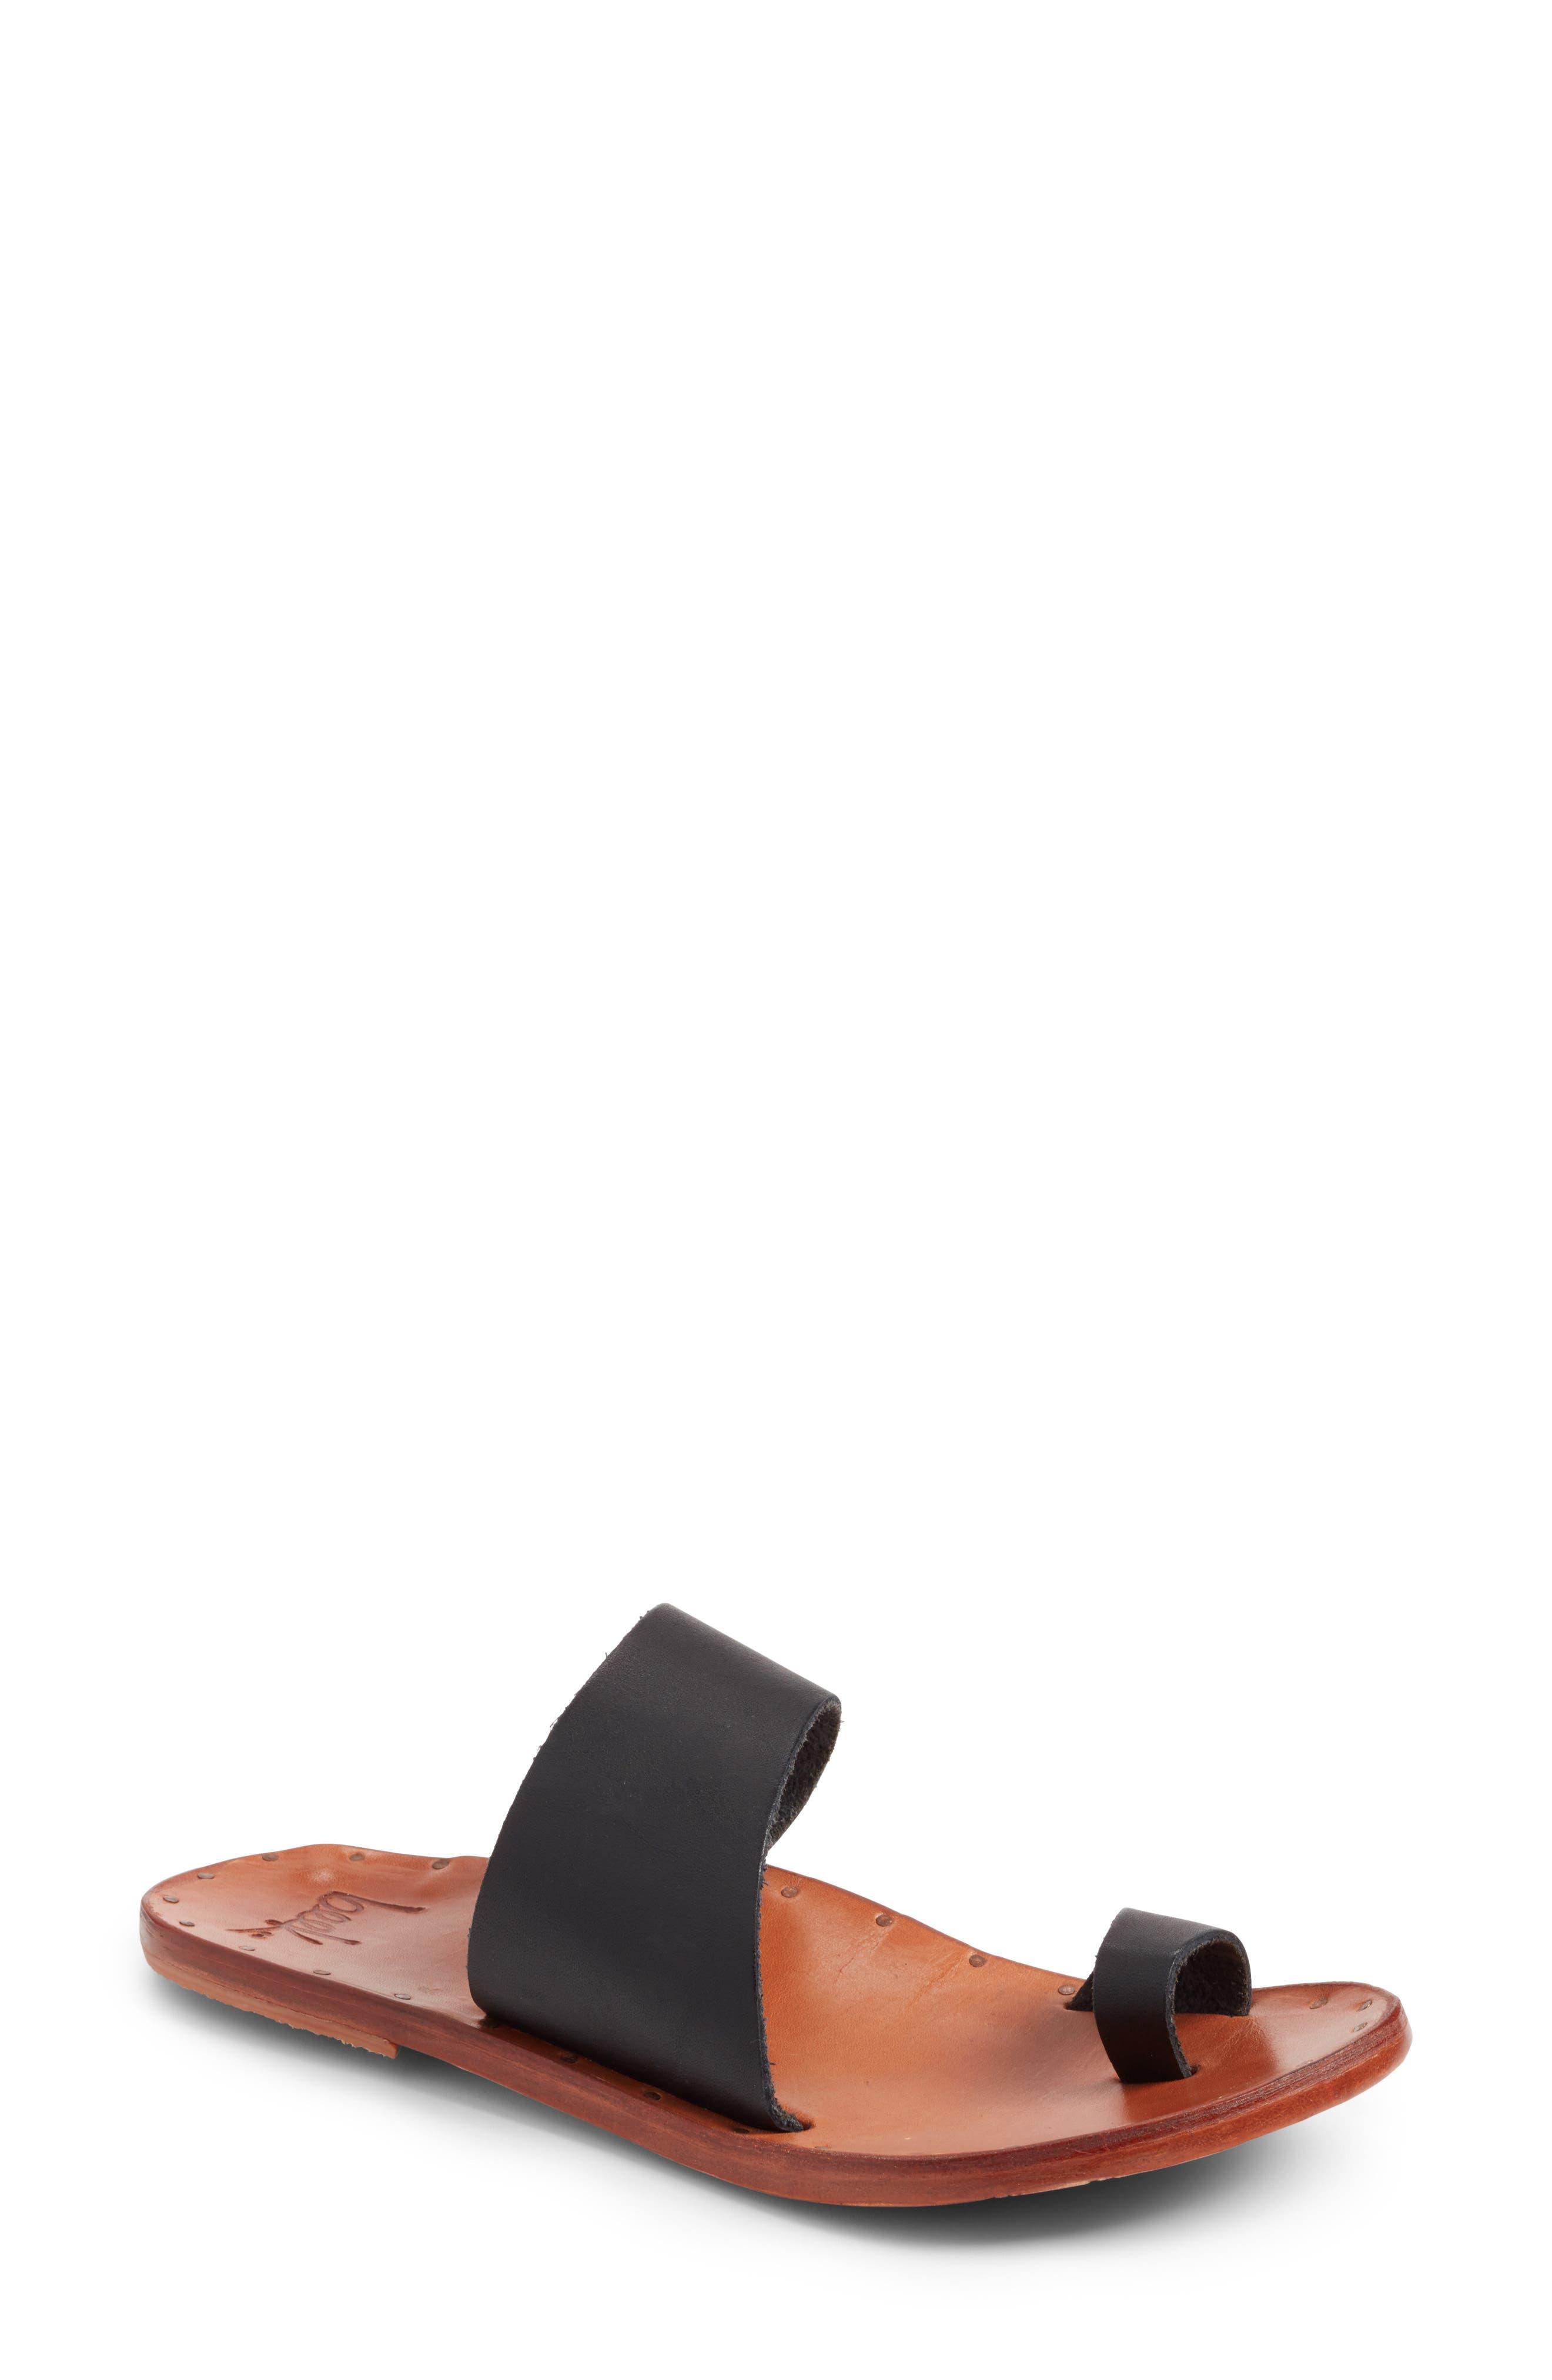 Alternate Image 1 Selected - Beek Finch Sandal (Women)